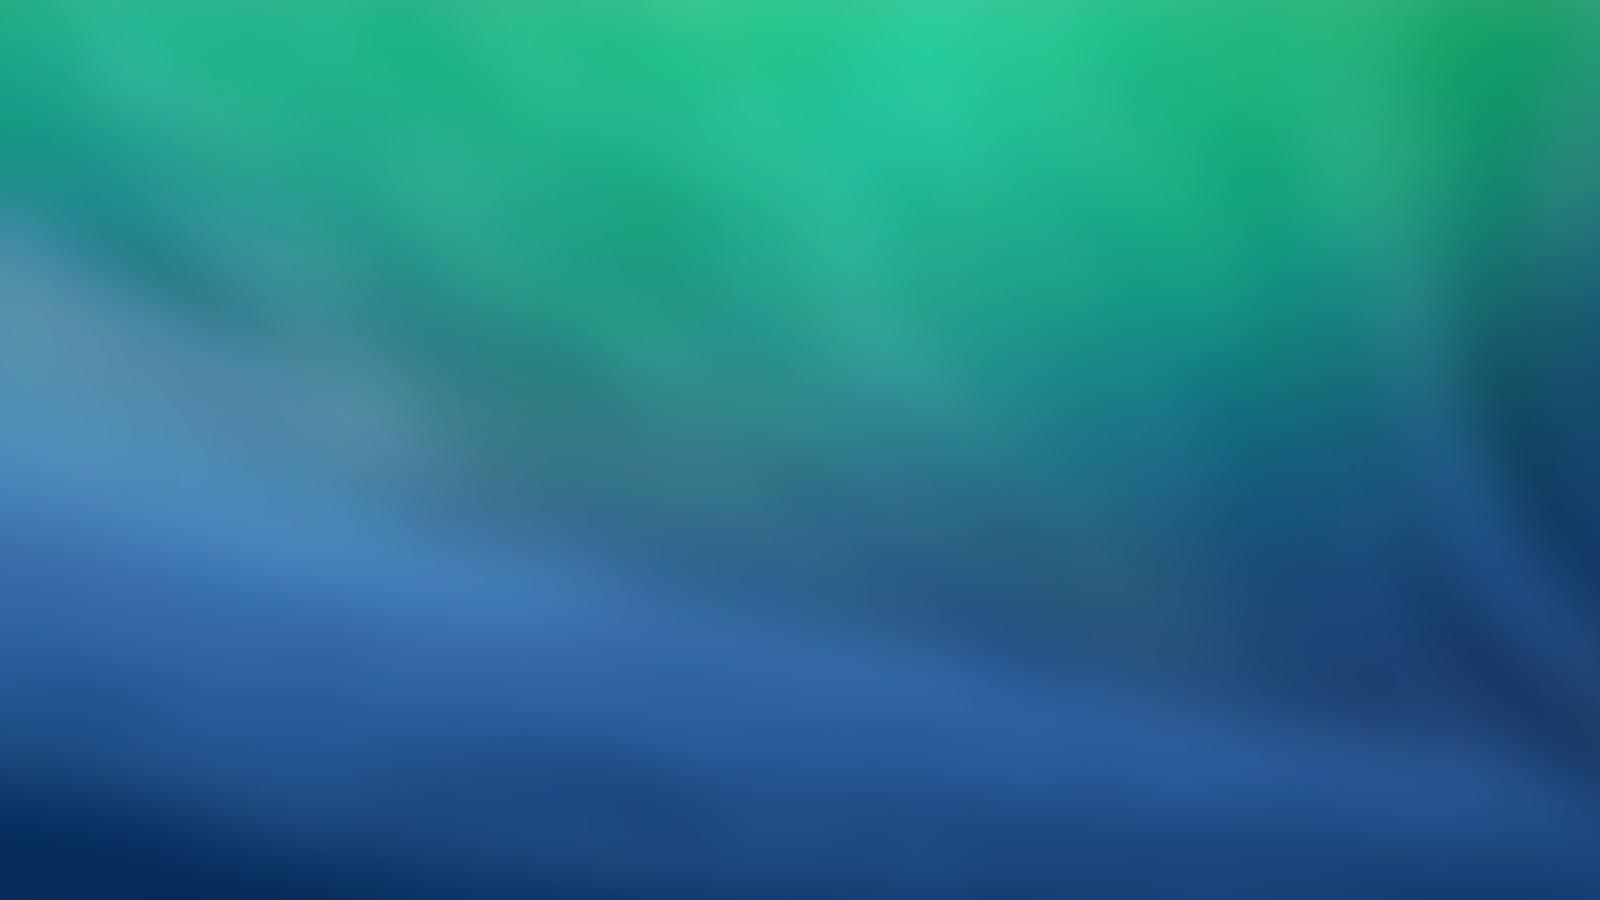 Wallpaper download mac - Download Mac Os X Hd Wallapaper Collection